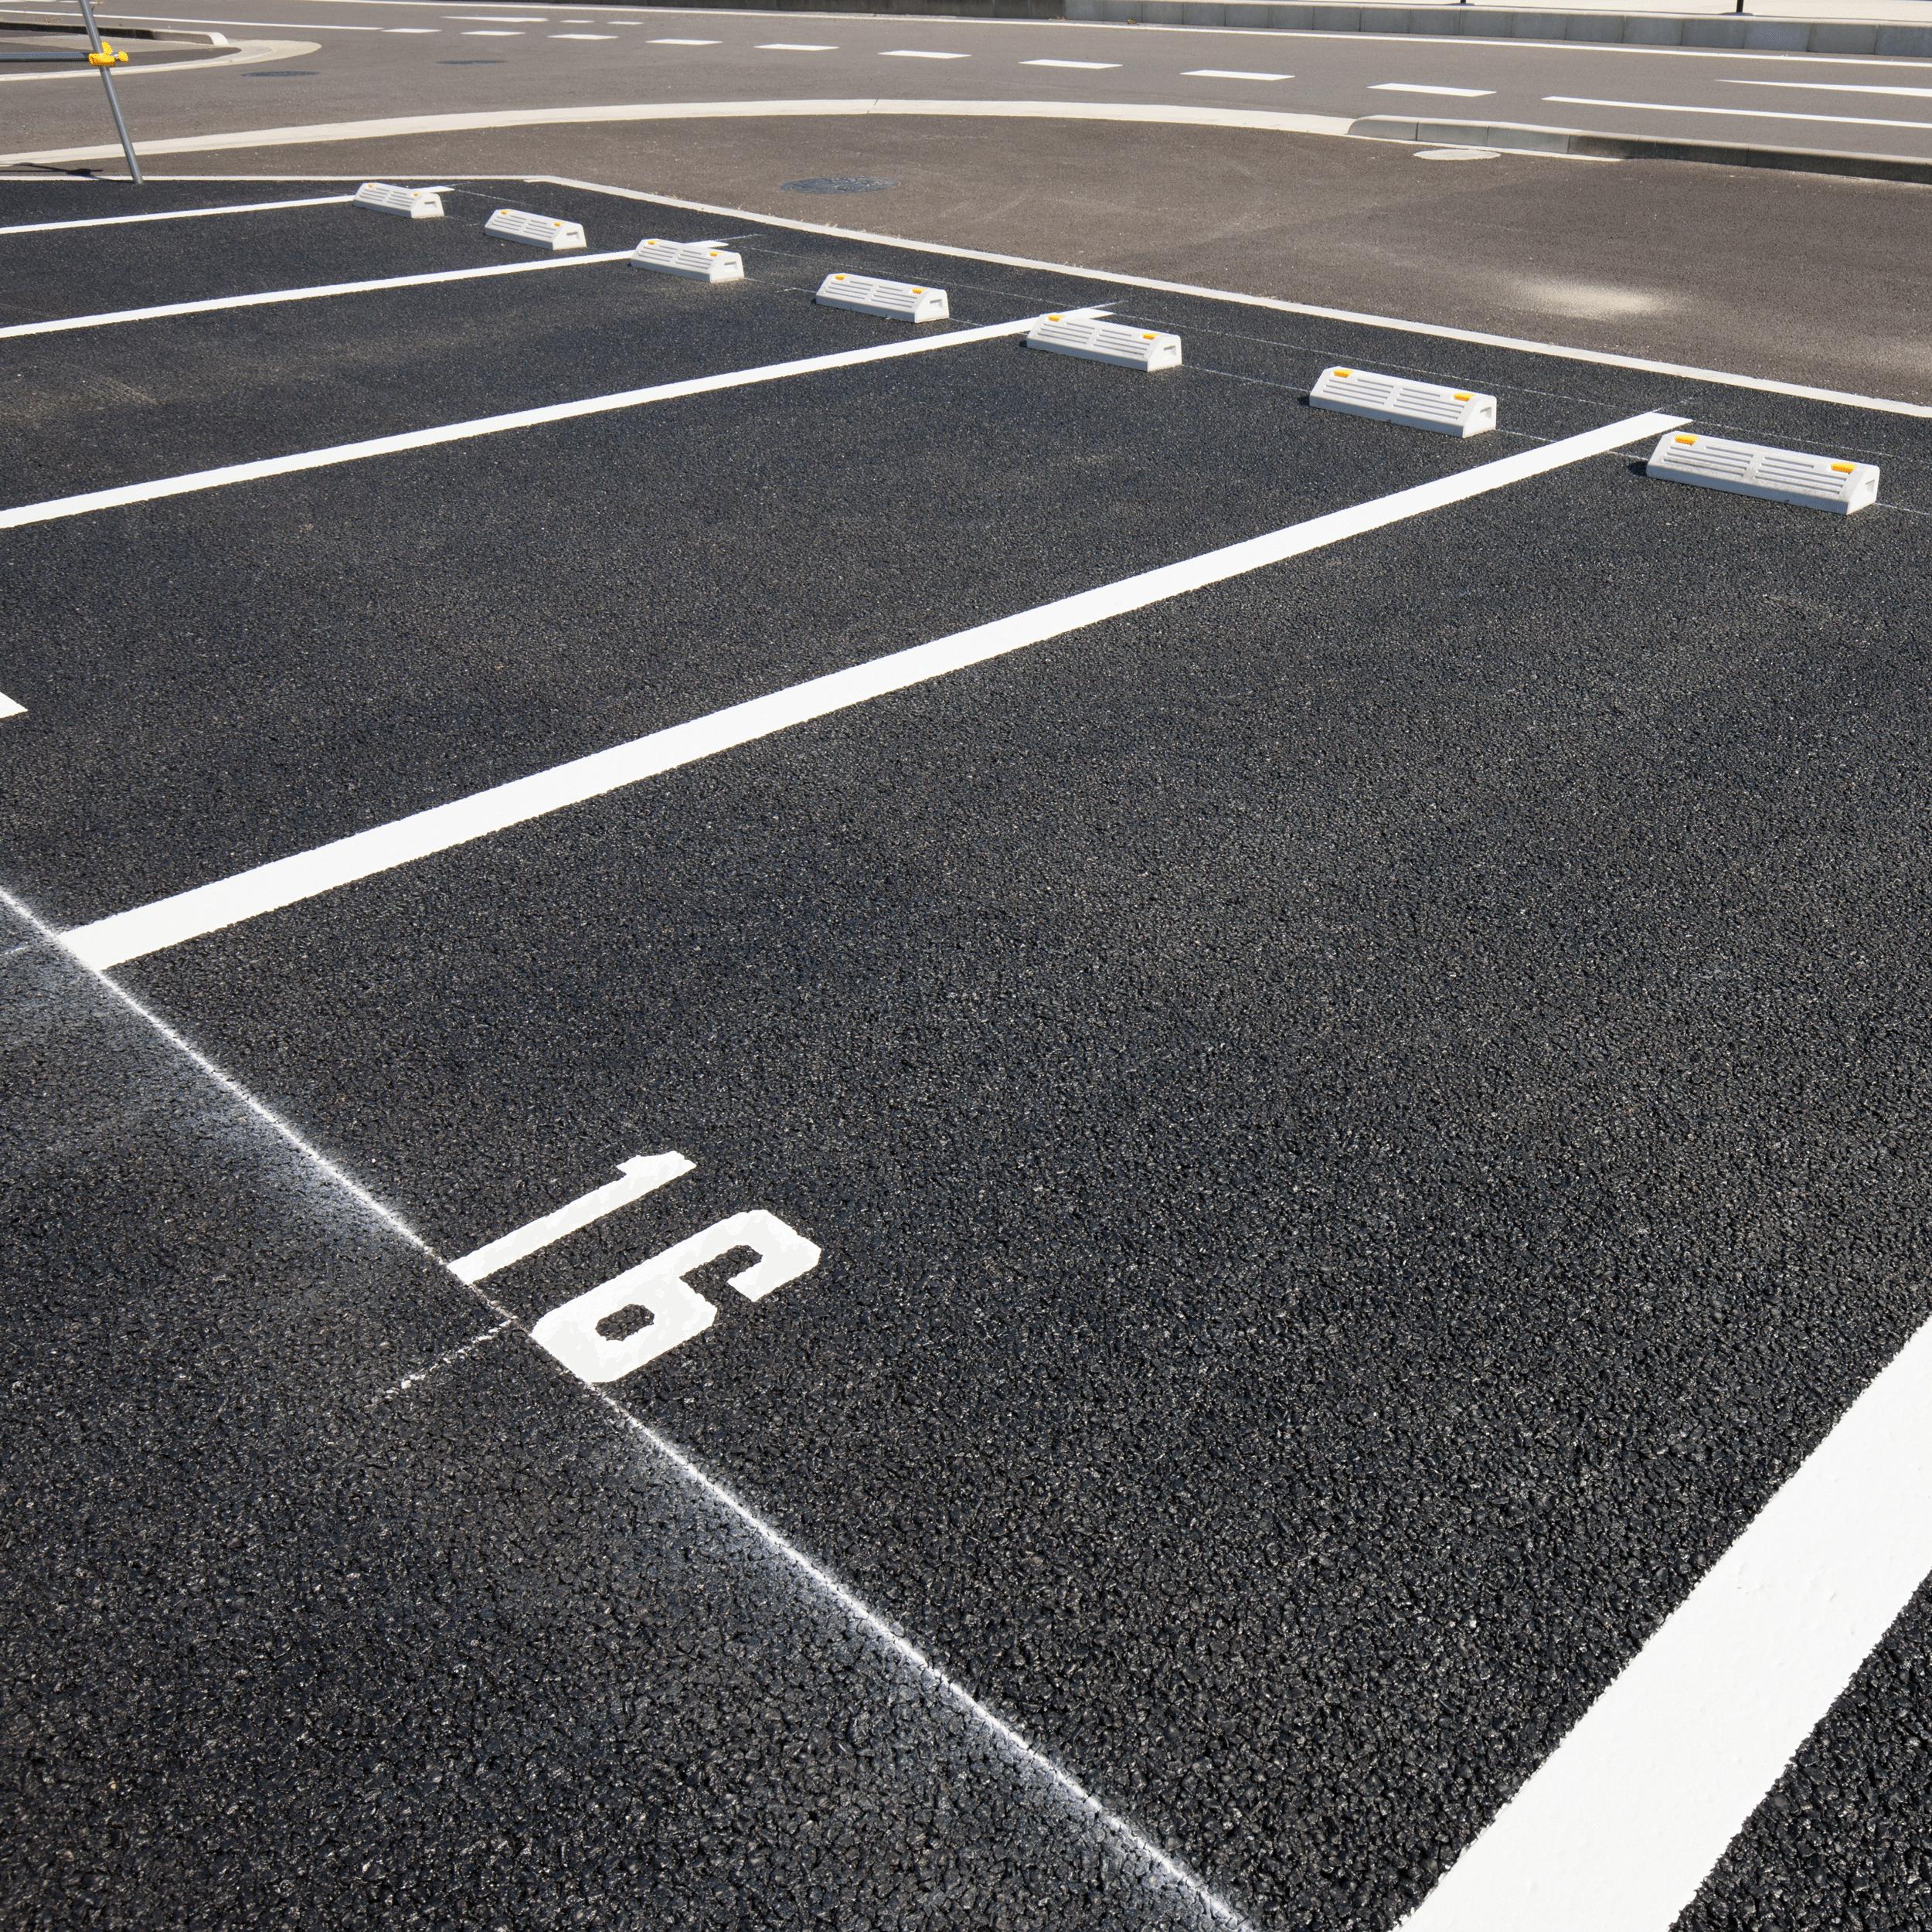 pavage-construction-stationnement